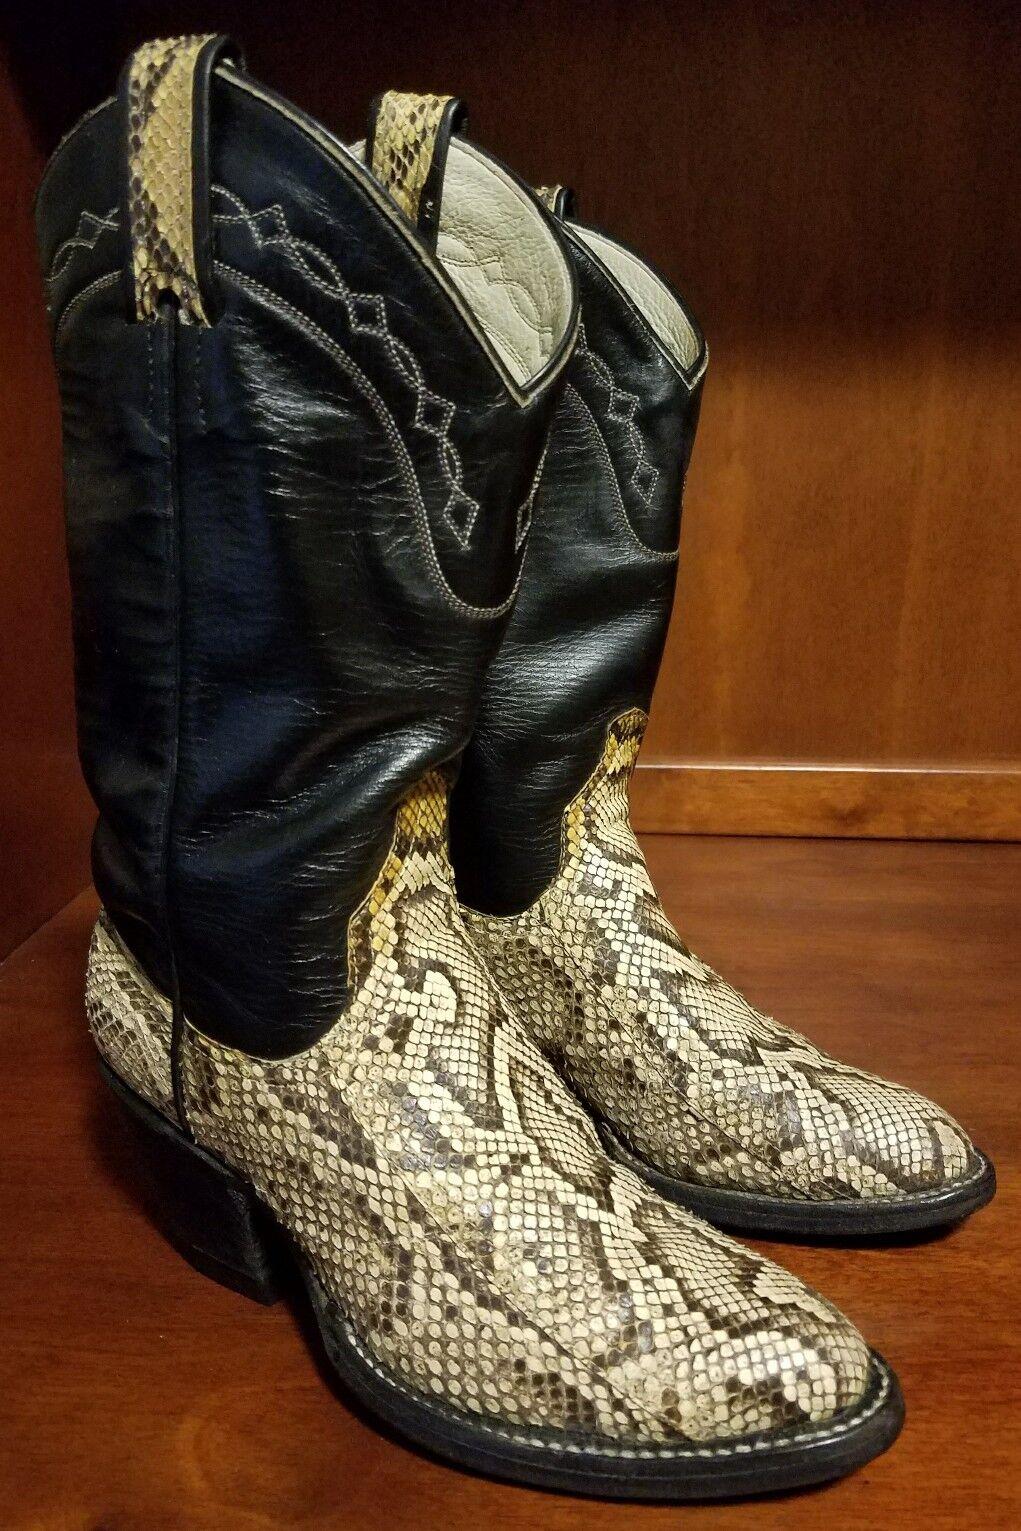 marchio famoso Larry Mahan donna avvio Collection Collection Collection Natural Python Snake Skin Dimensione 5 B Vintage  offerta speciale